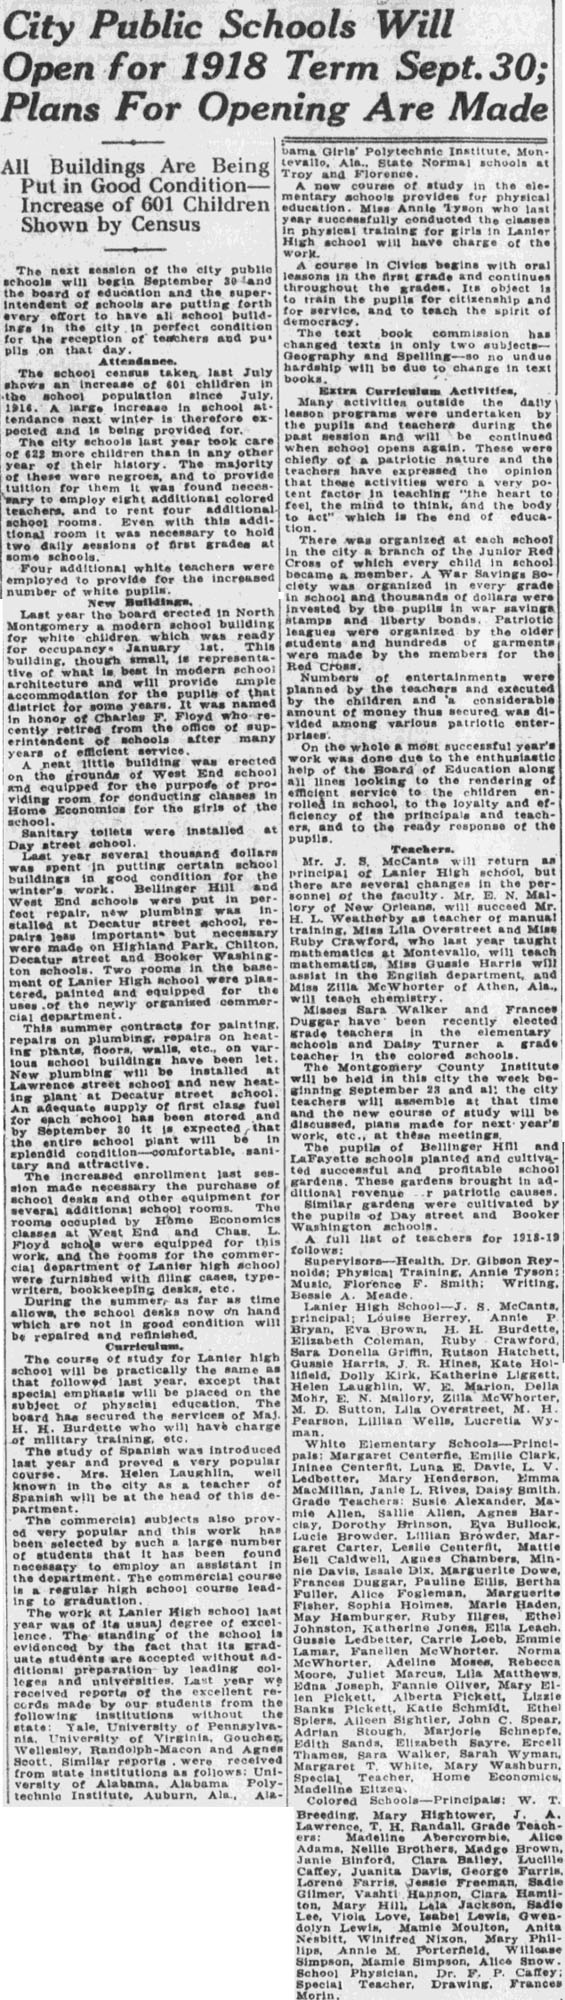 Montgomery Advertiser Thursday, august 15, 1918